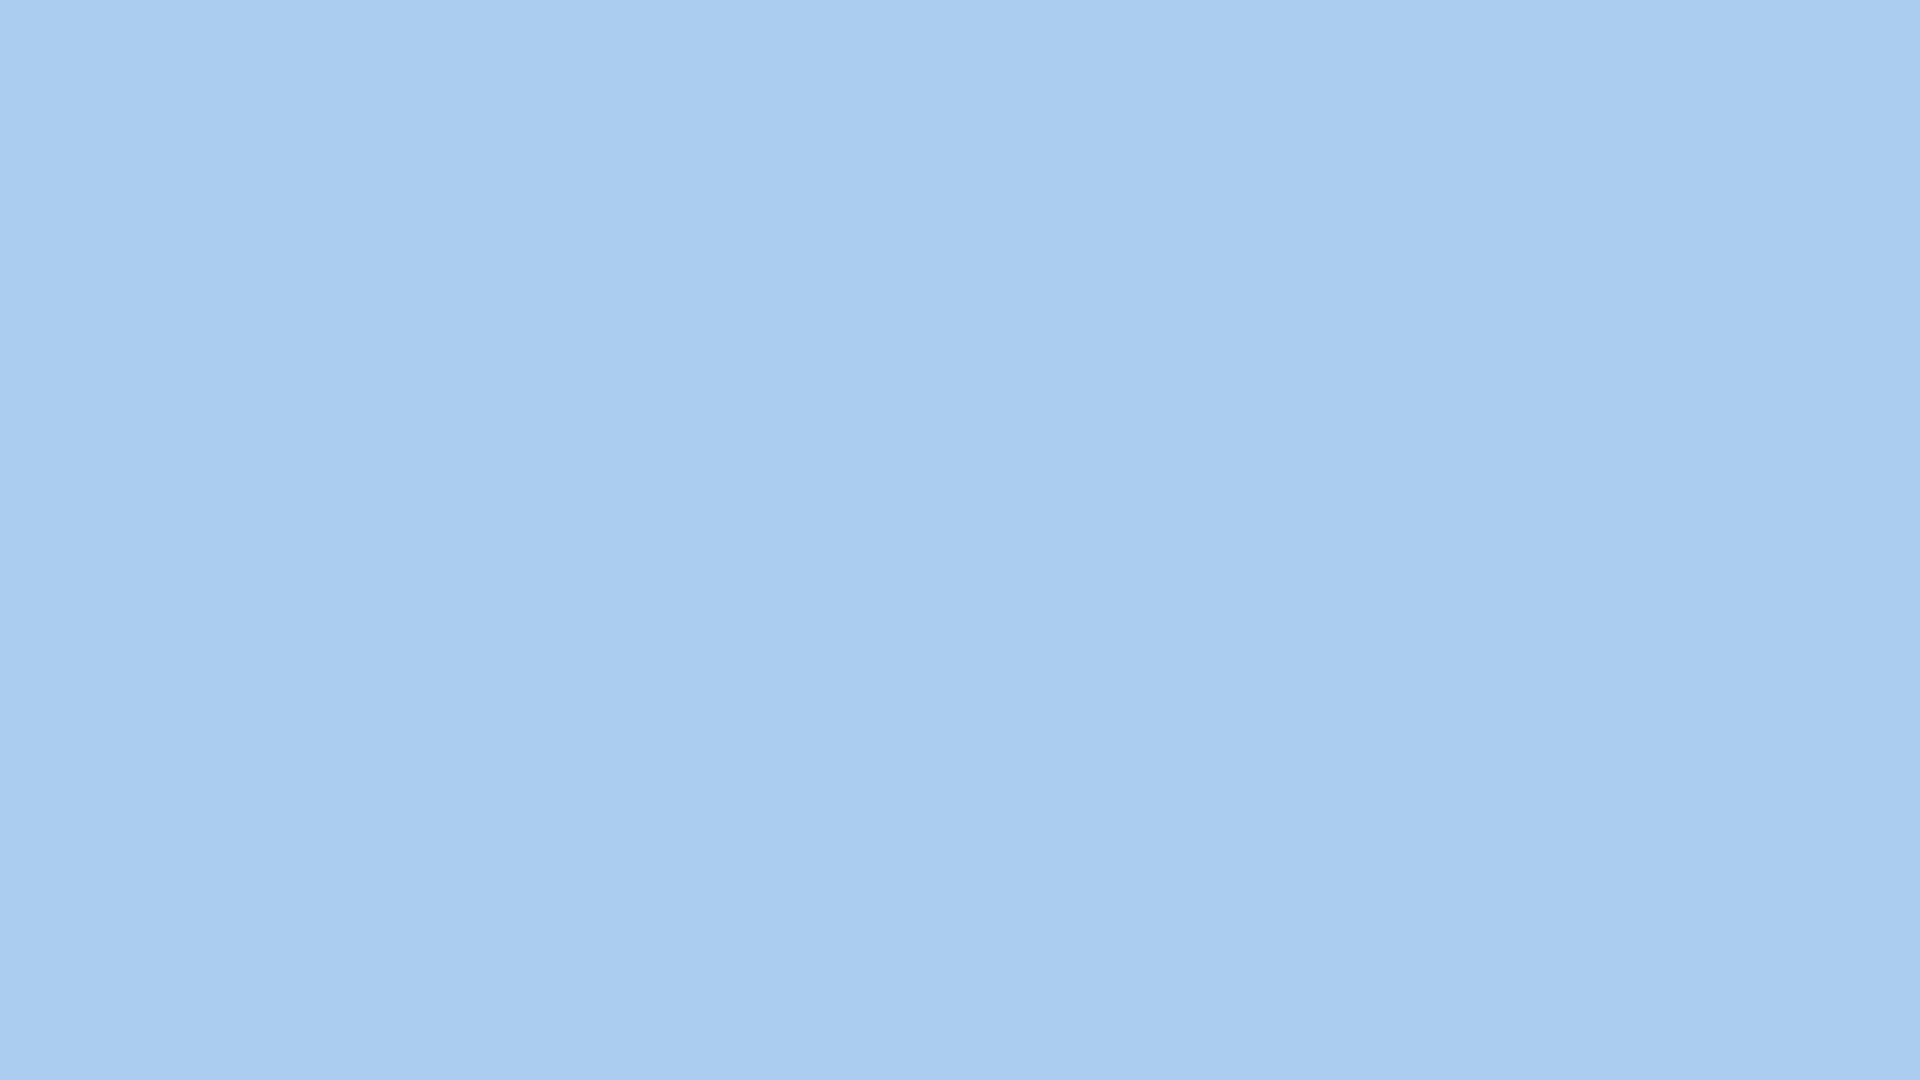 1920x1080 Pale Cornflower Blue Solid Color Background